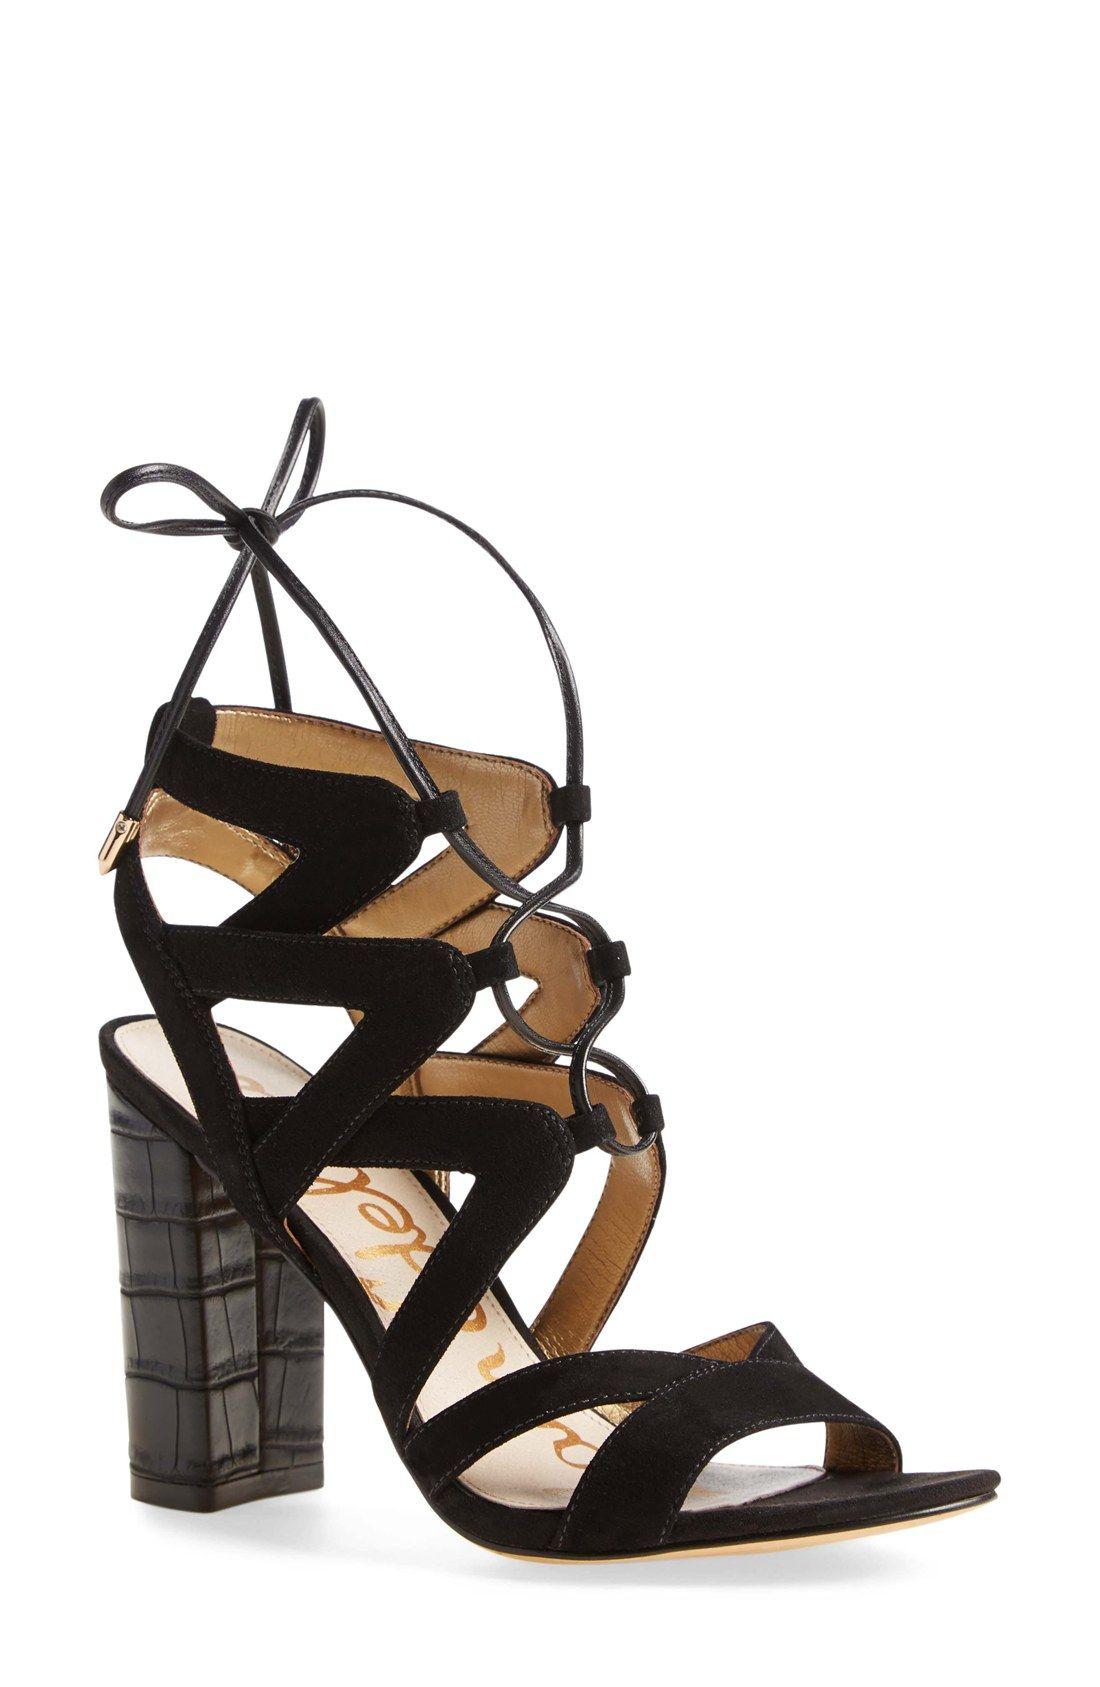 Womens sandals marshalls -  Yardley Lace Up Sandal